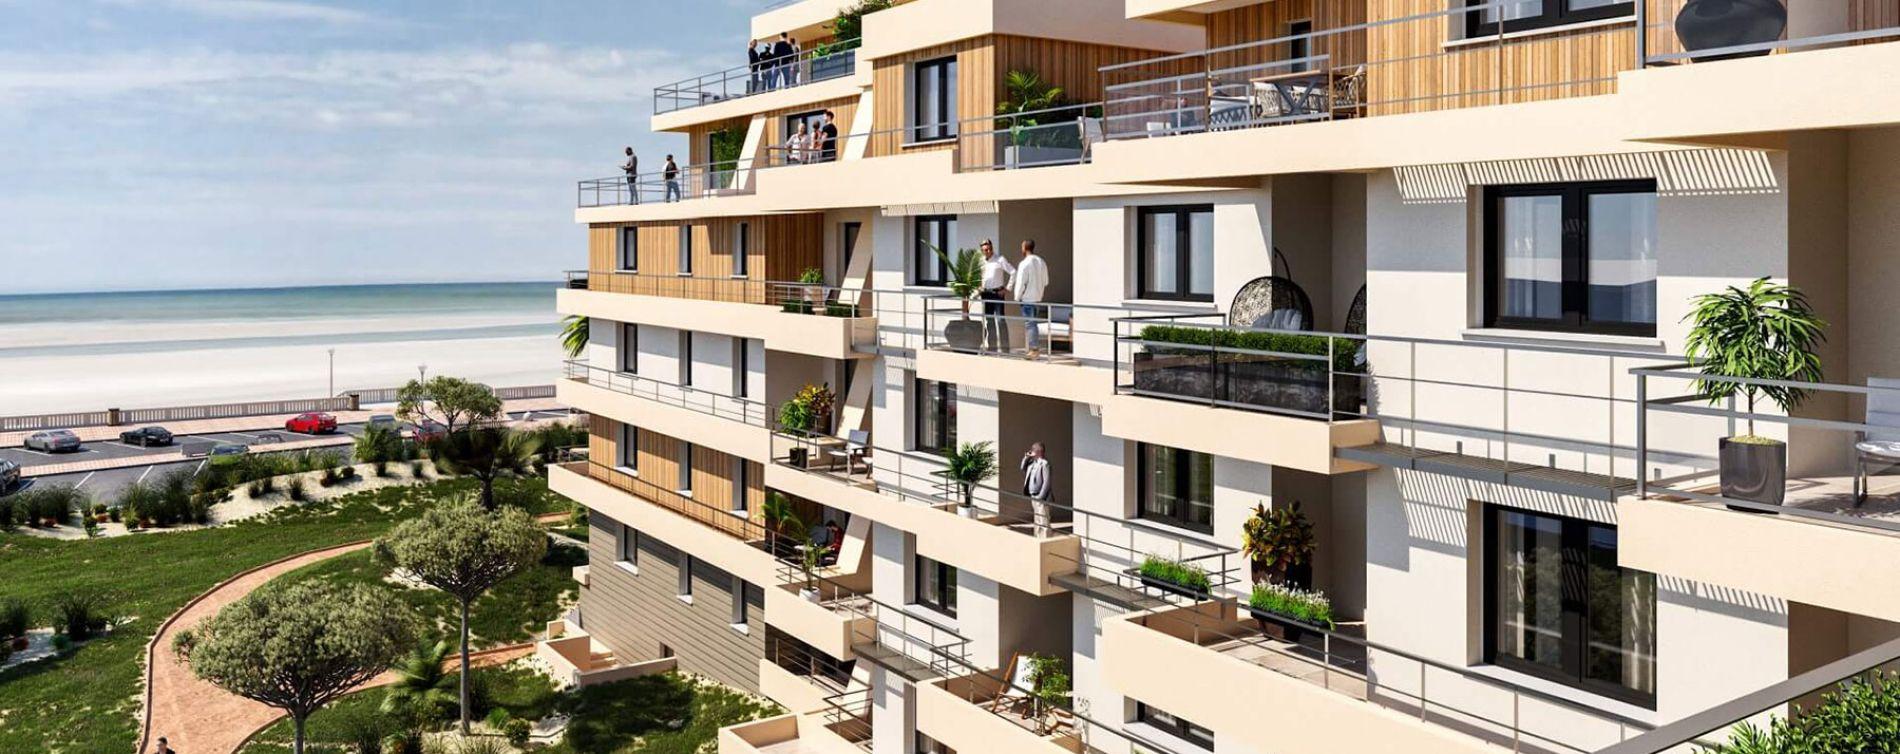 Cucq : programme immobilier neuve « Face Mer »